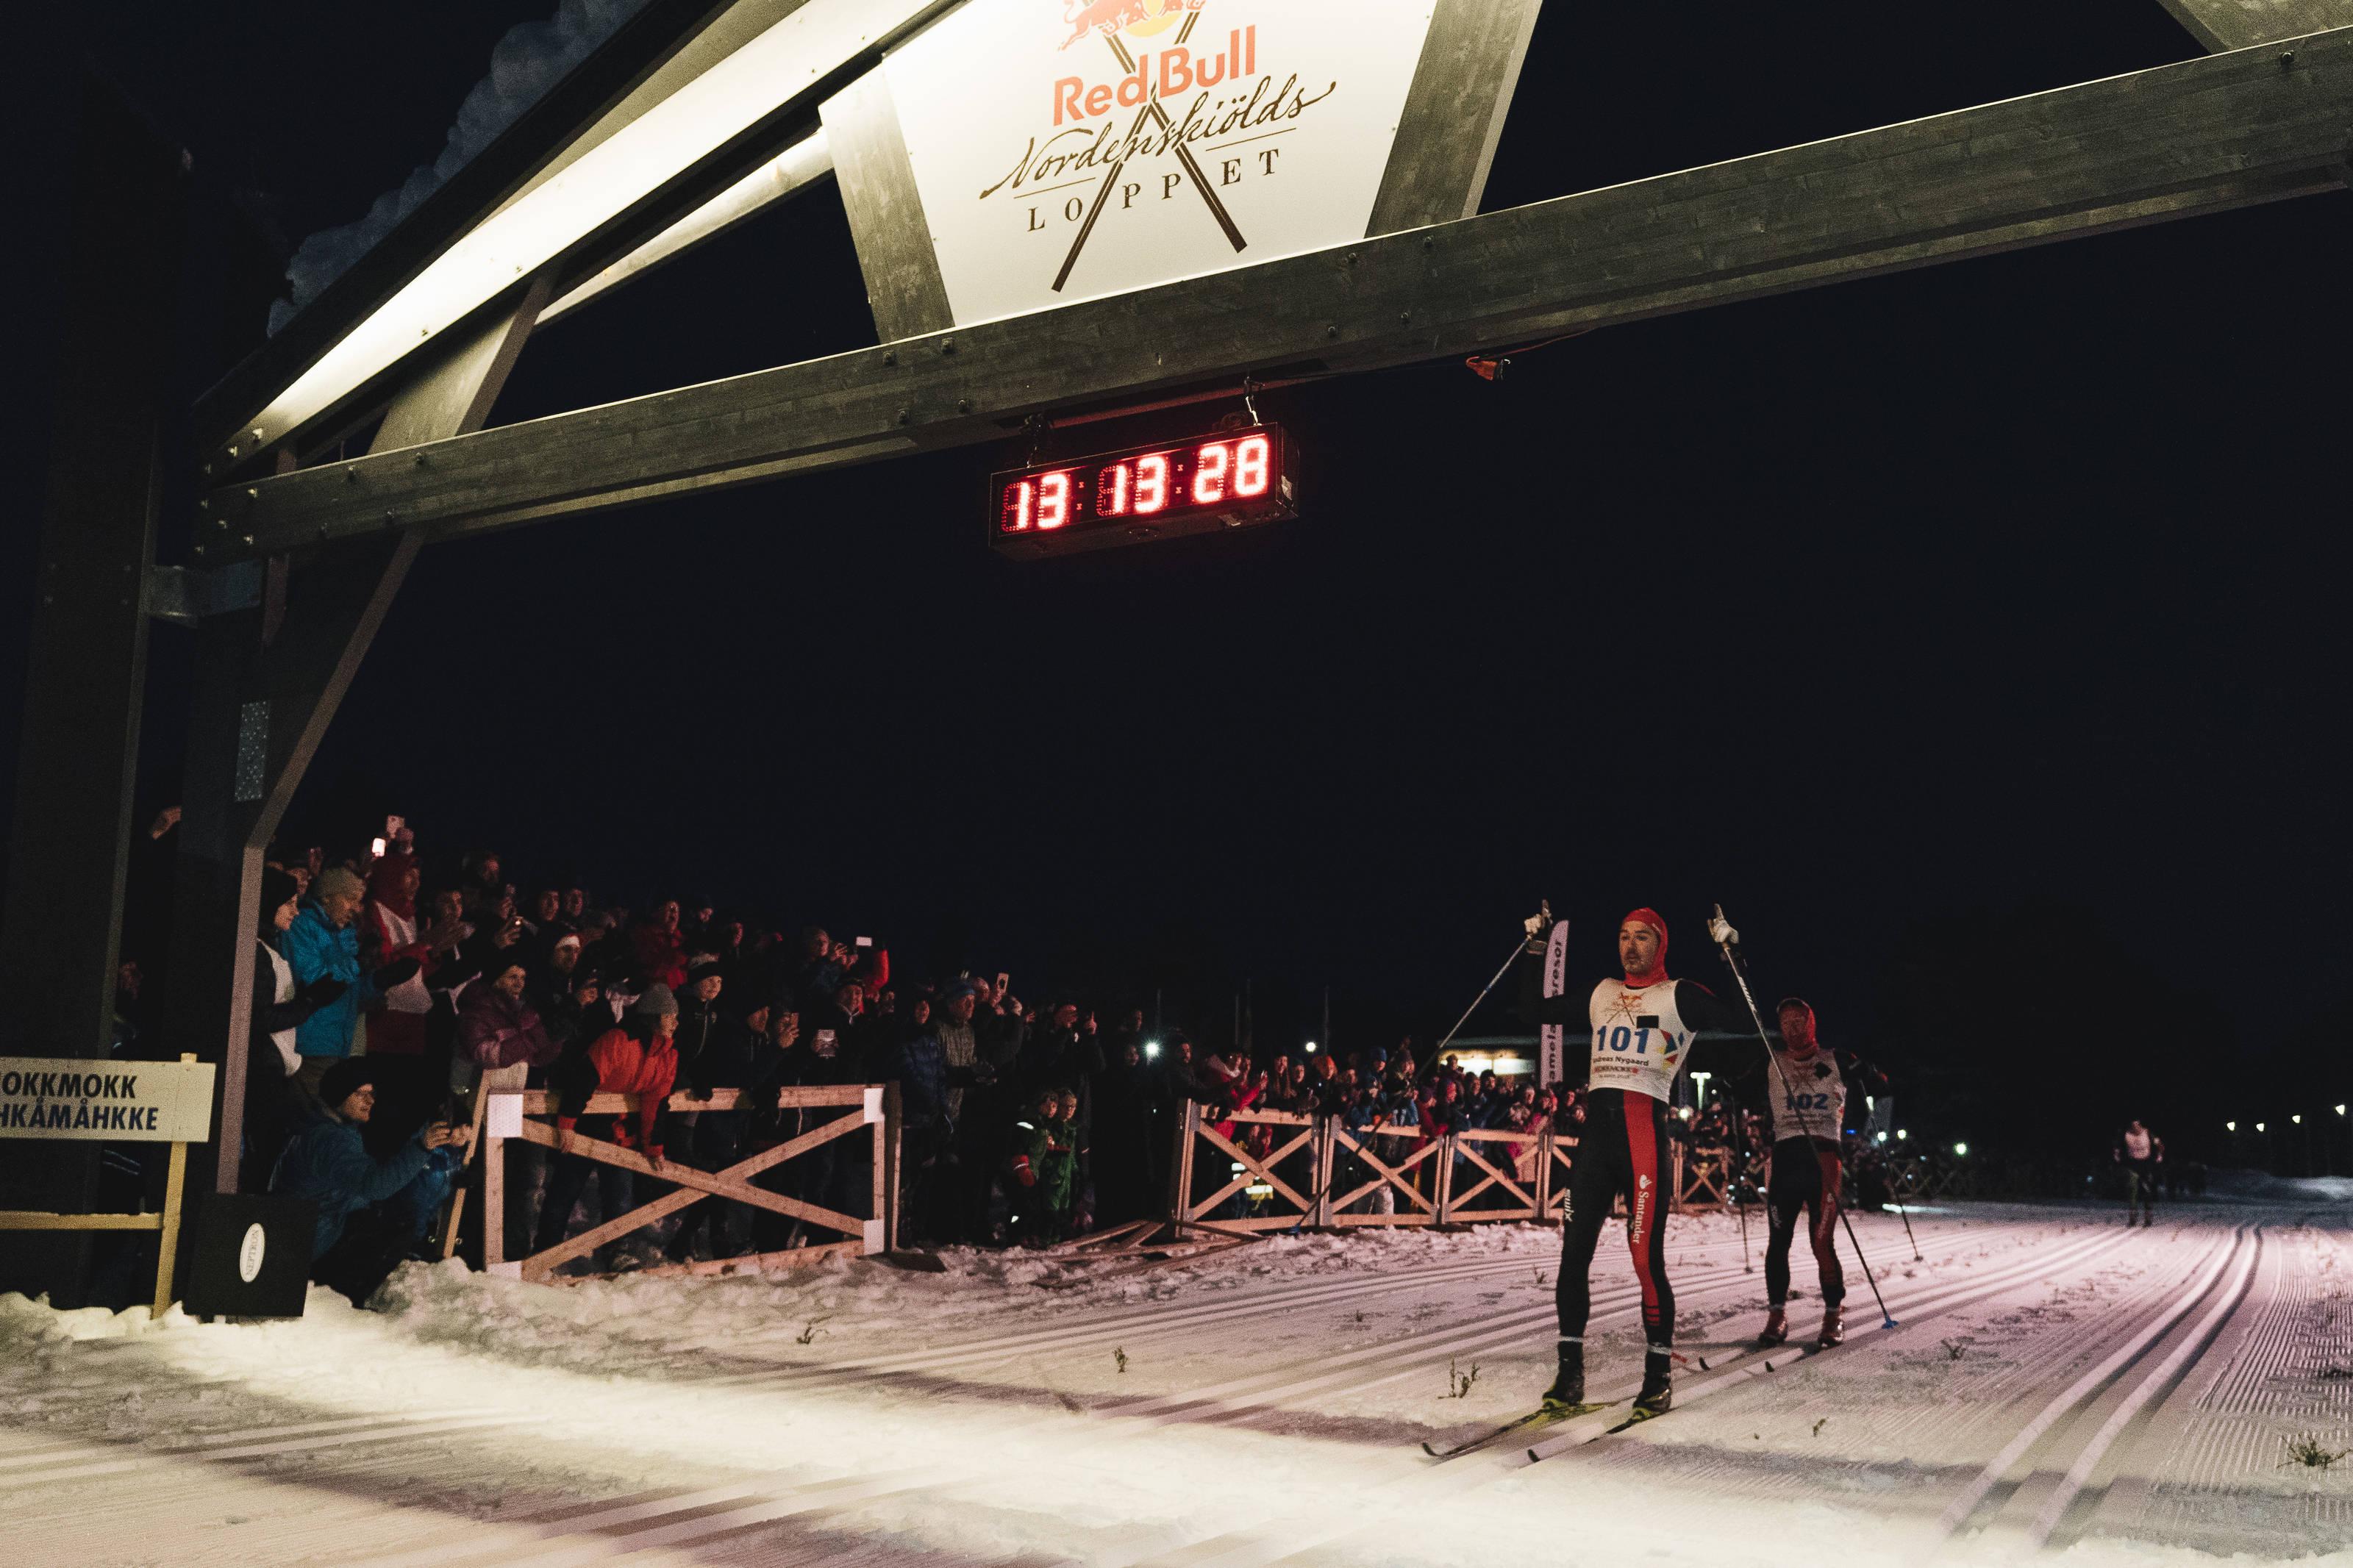 jokkmokk single women One of the world's foremost trail runners, emelie forsberg, is running along  kungsleden at the moment  his goal now is to teach women to love fly fishing.